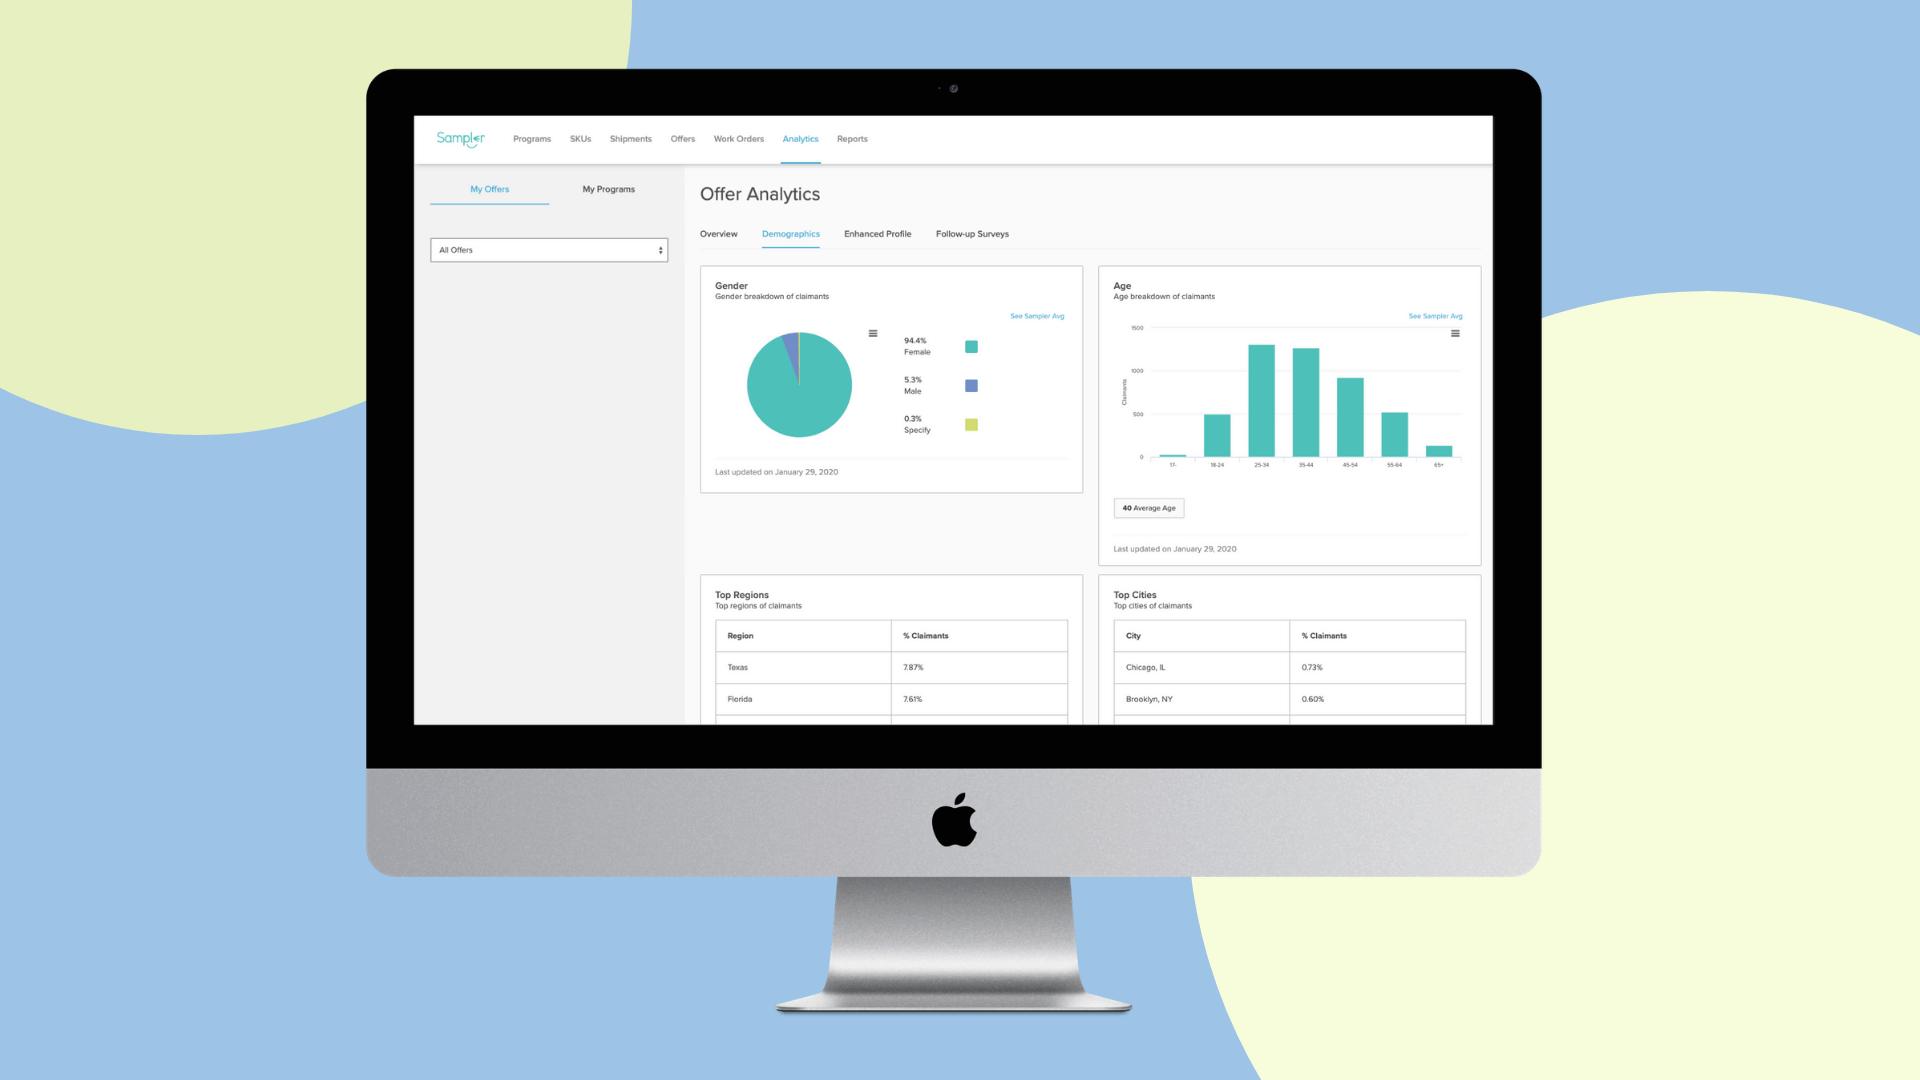 Sampler's offer analytics dashboard for digital product sampling programs